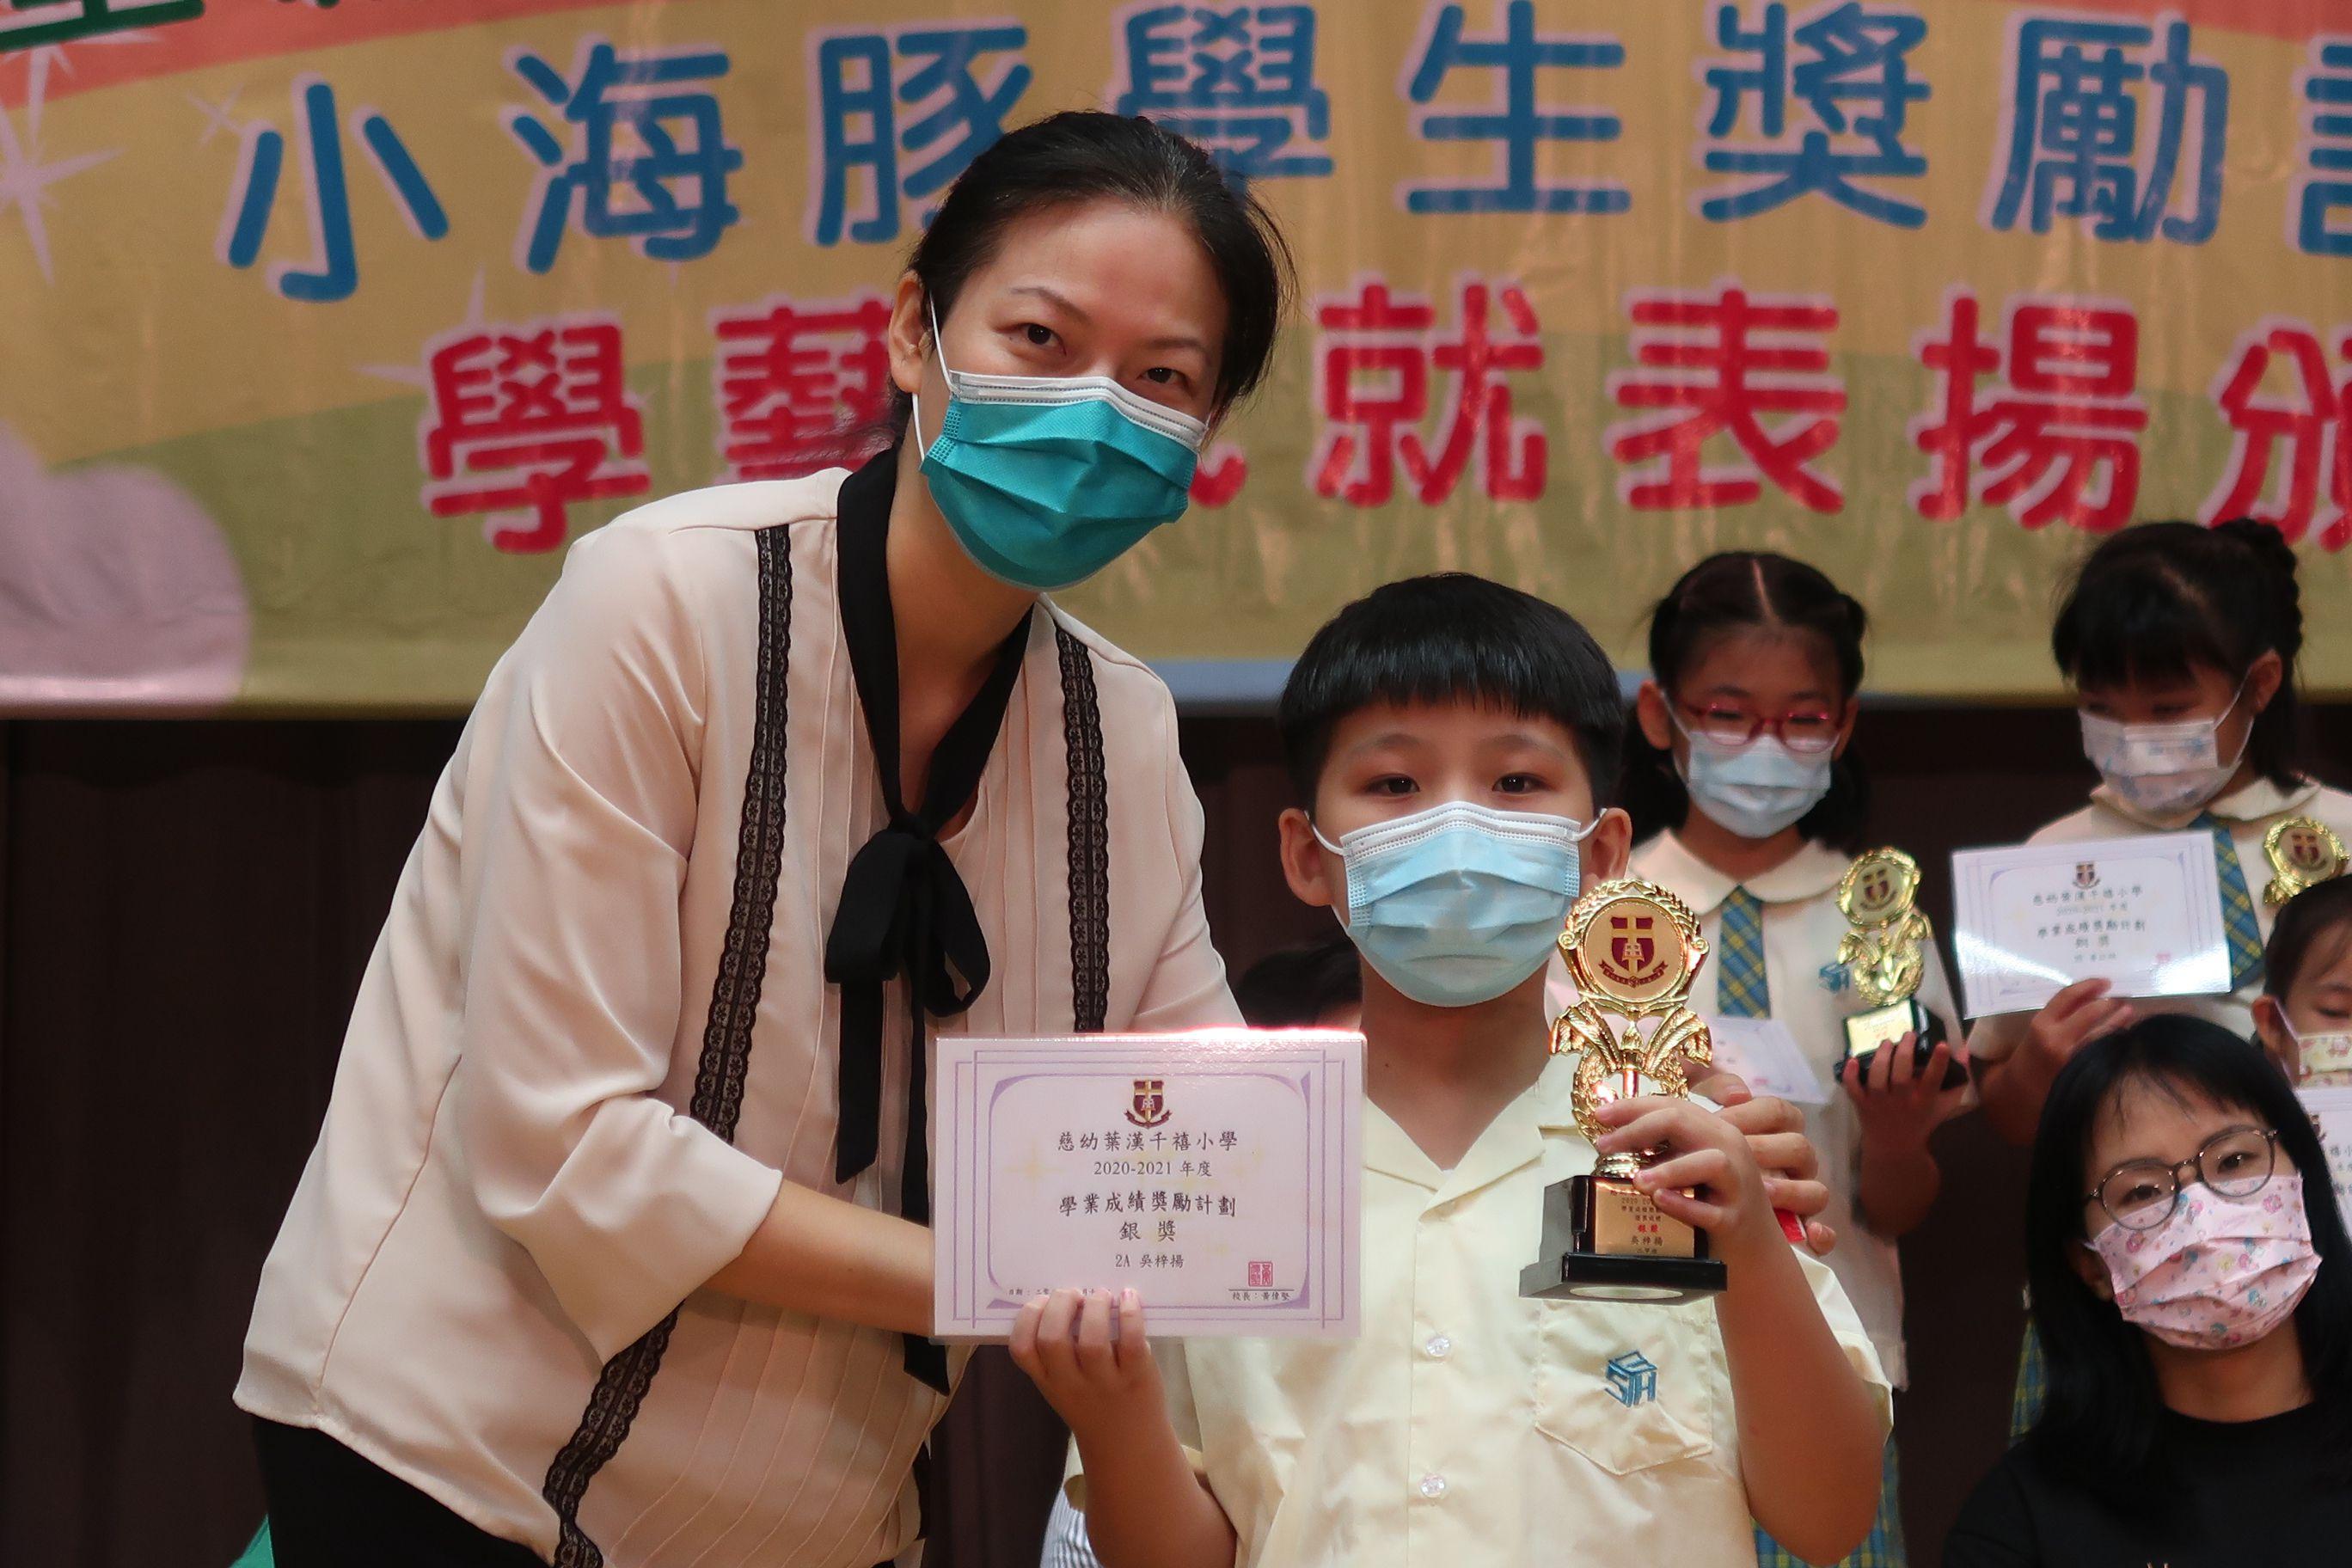 https://syh.edu.hk/sites/default/files/img_5548.jpg